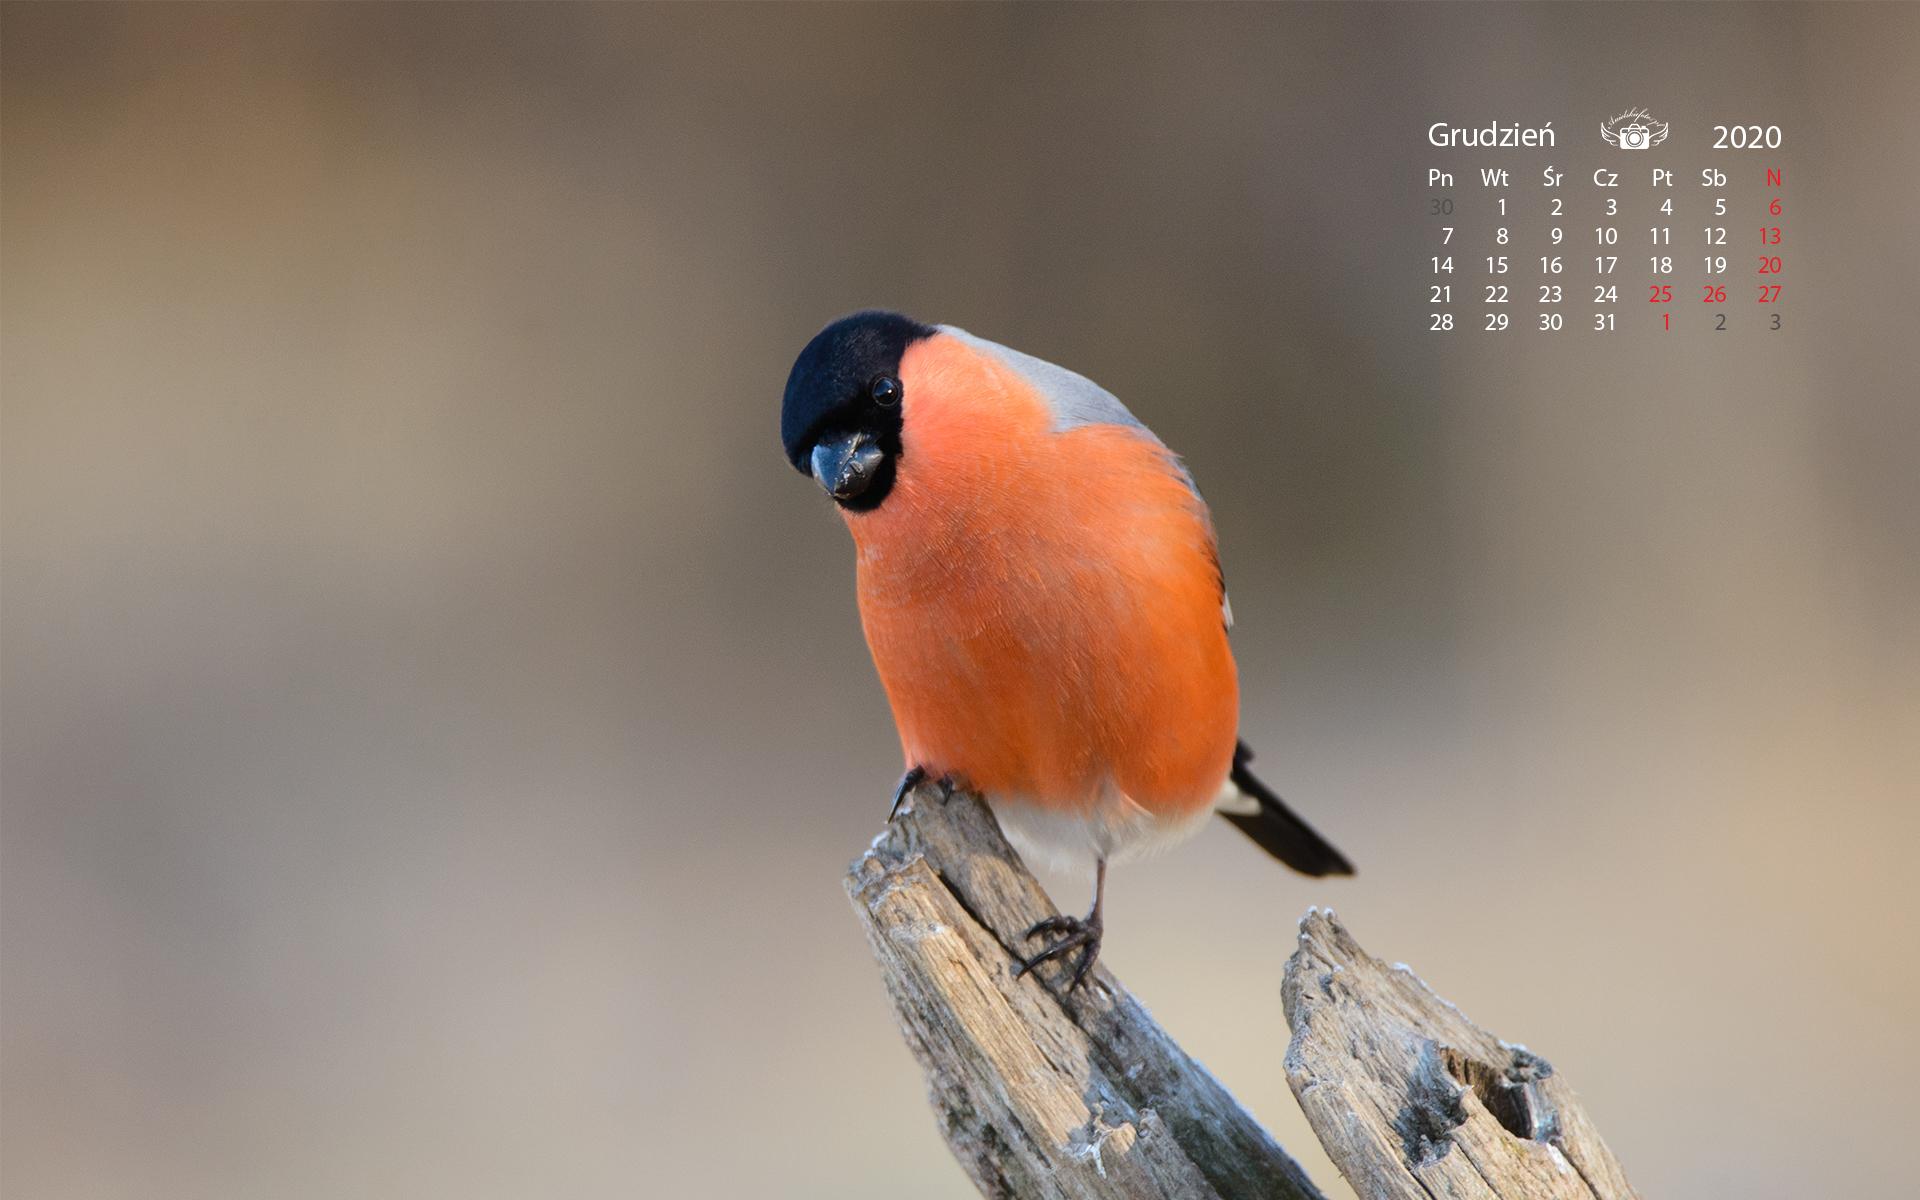 Kalendarz2020grudzien 1920 1200 72 Grudzień 2020 – tapeta na pulpit